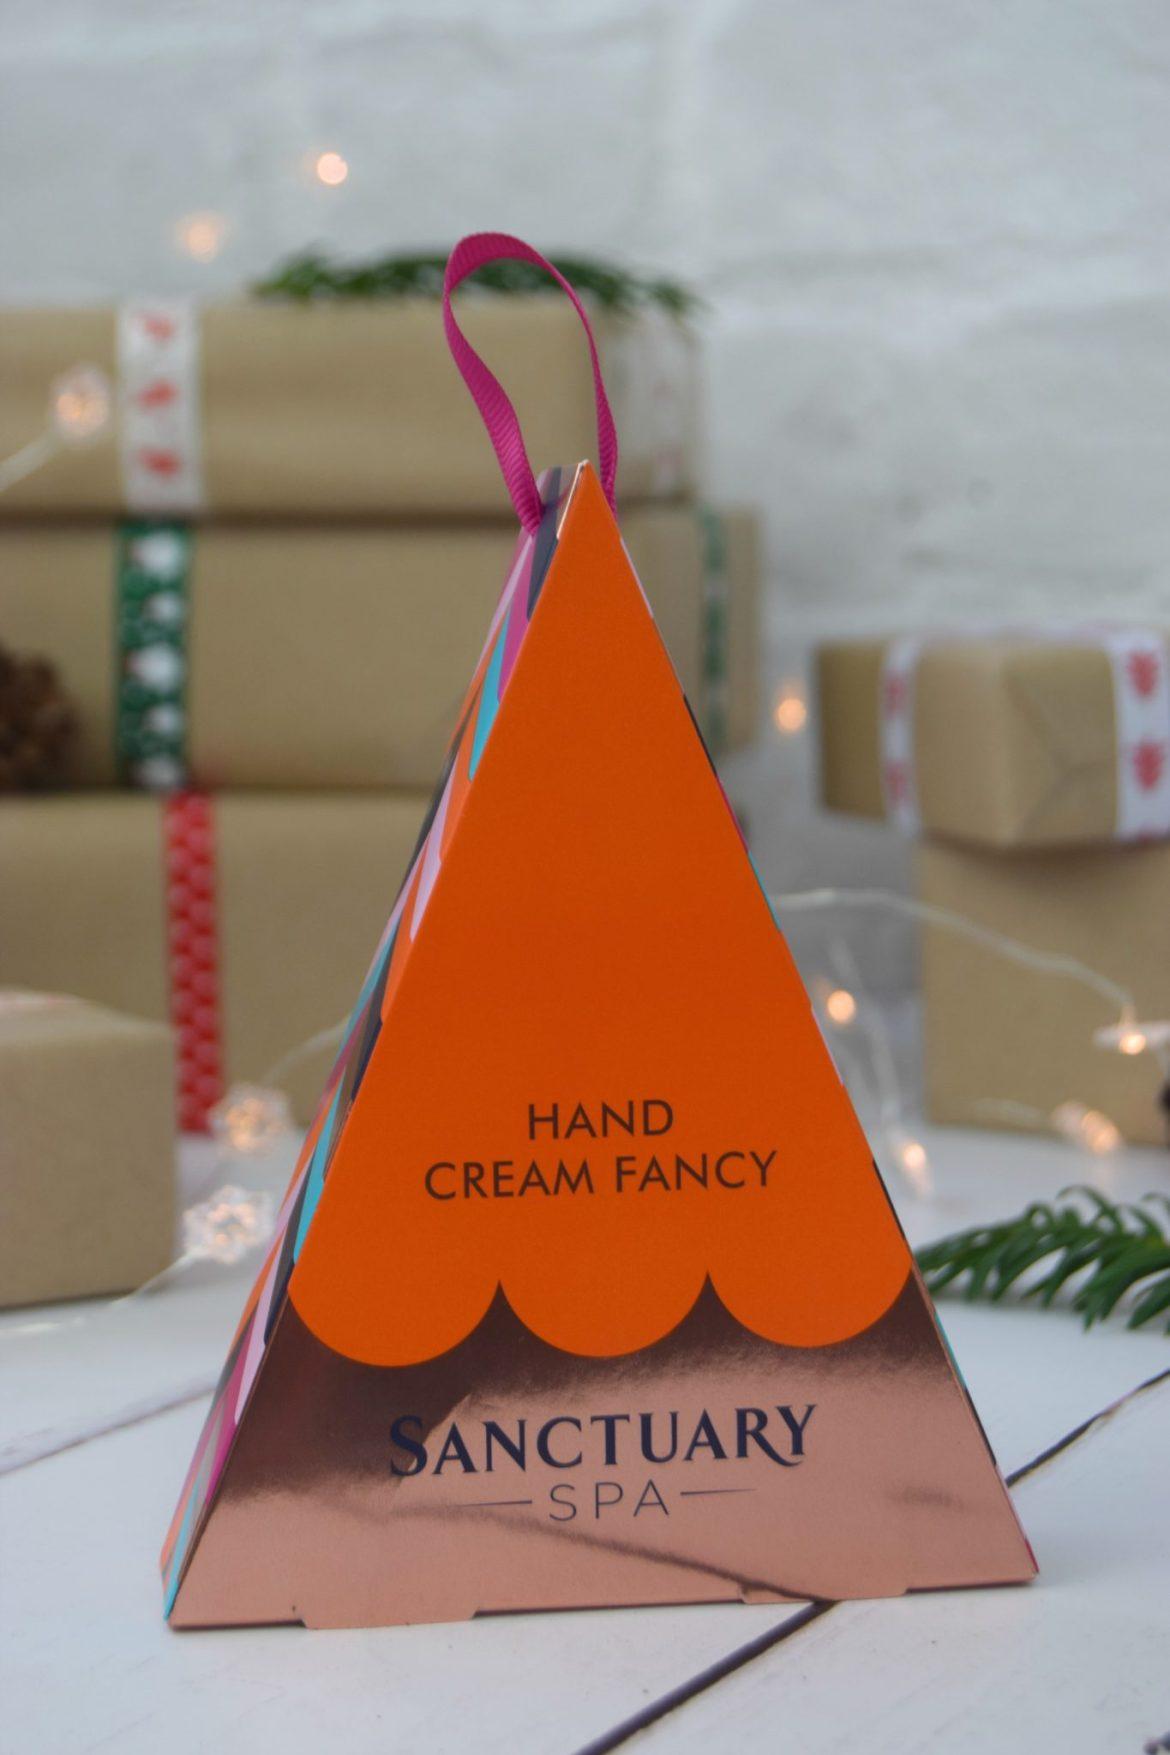 Sanctuary Spa hand cream